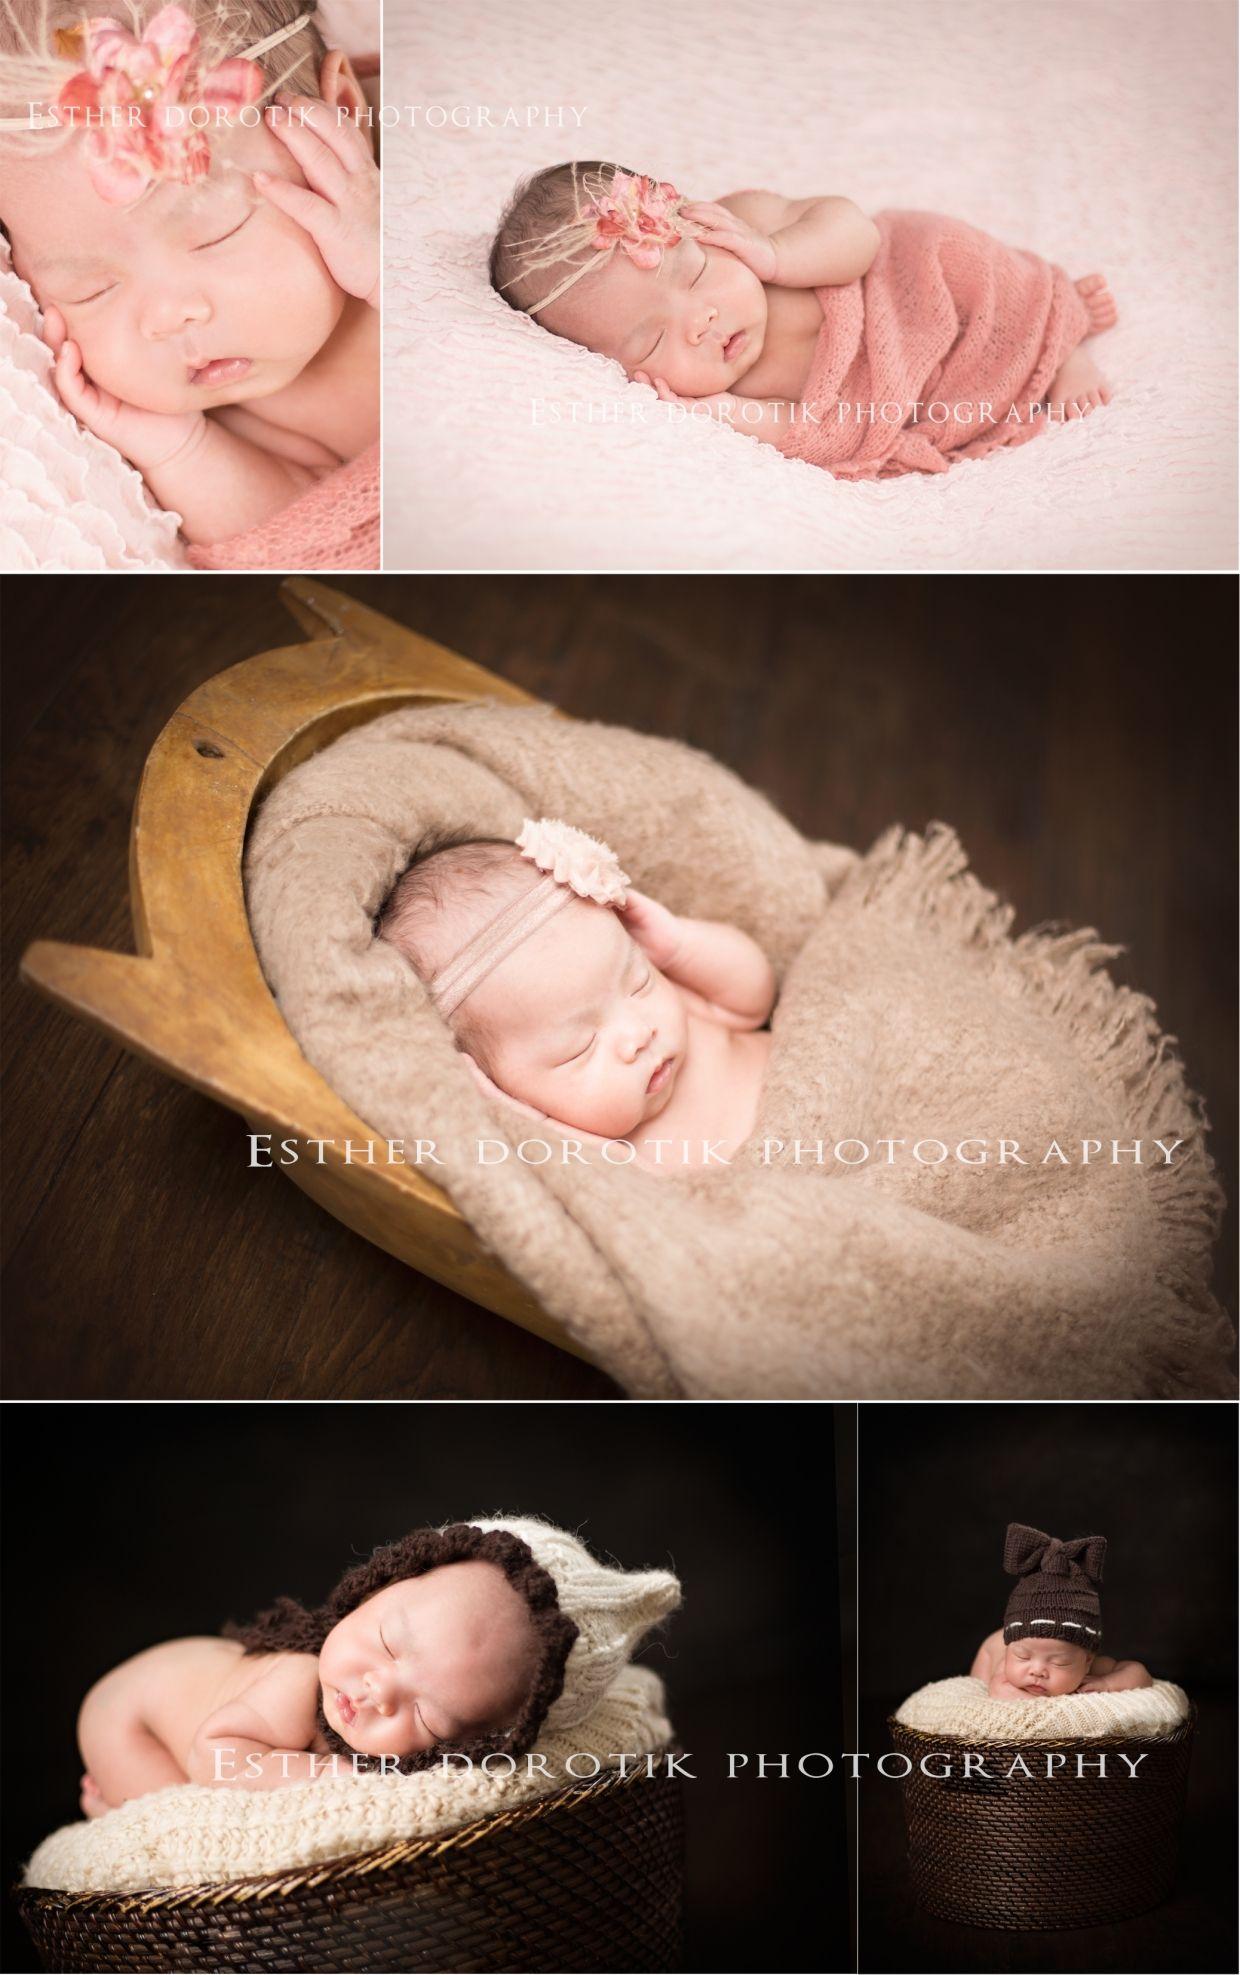 Newborn photography 4 week old studio lighting